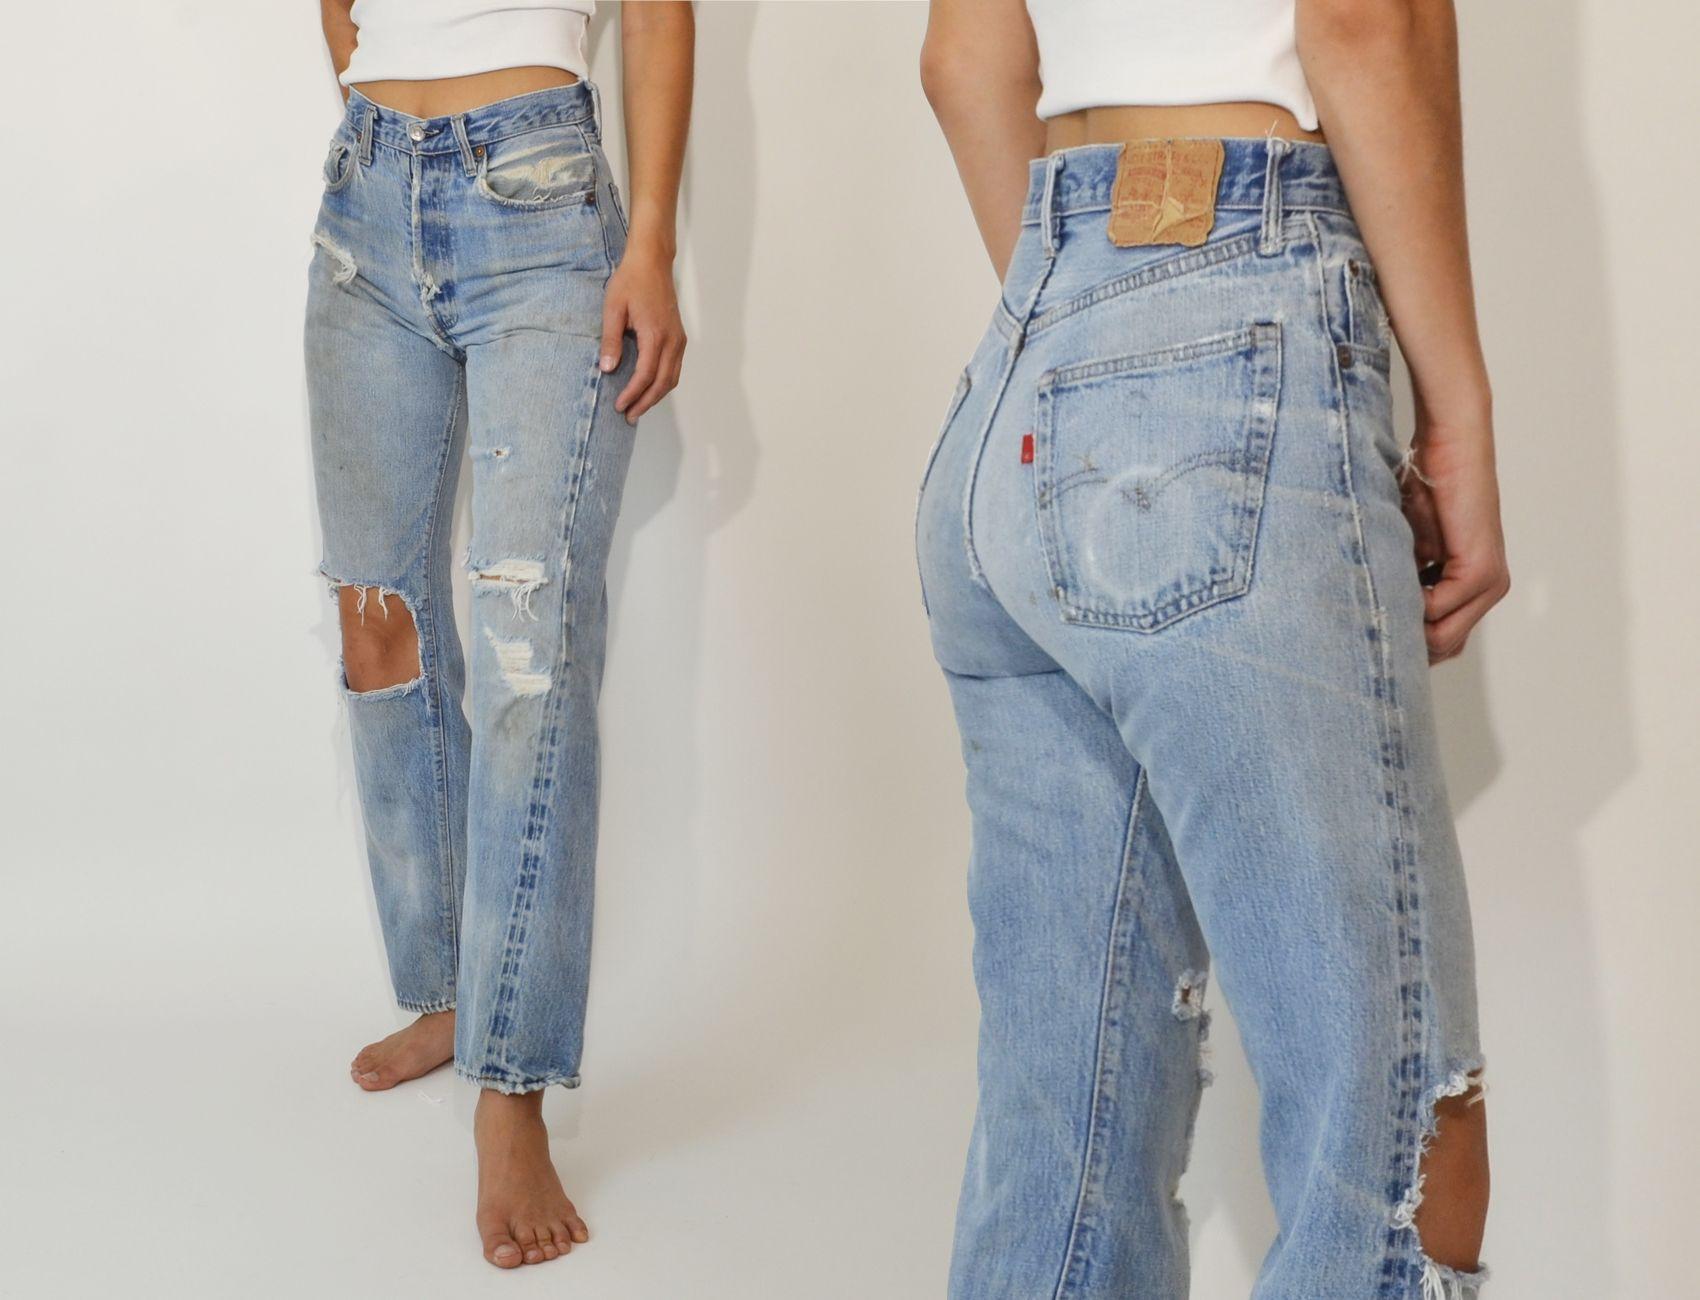 Vinage Levi S 501 Levi Jeans Outfit High Waisted Denim Jeans High Waisted Denim